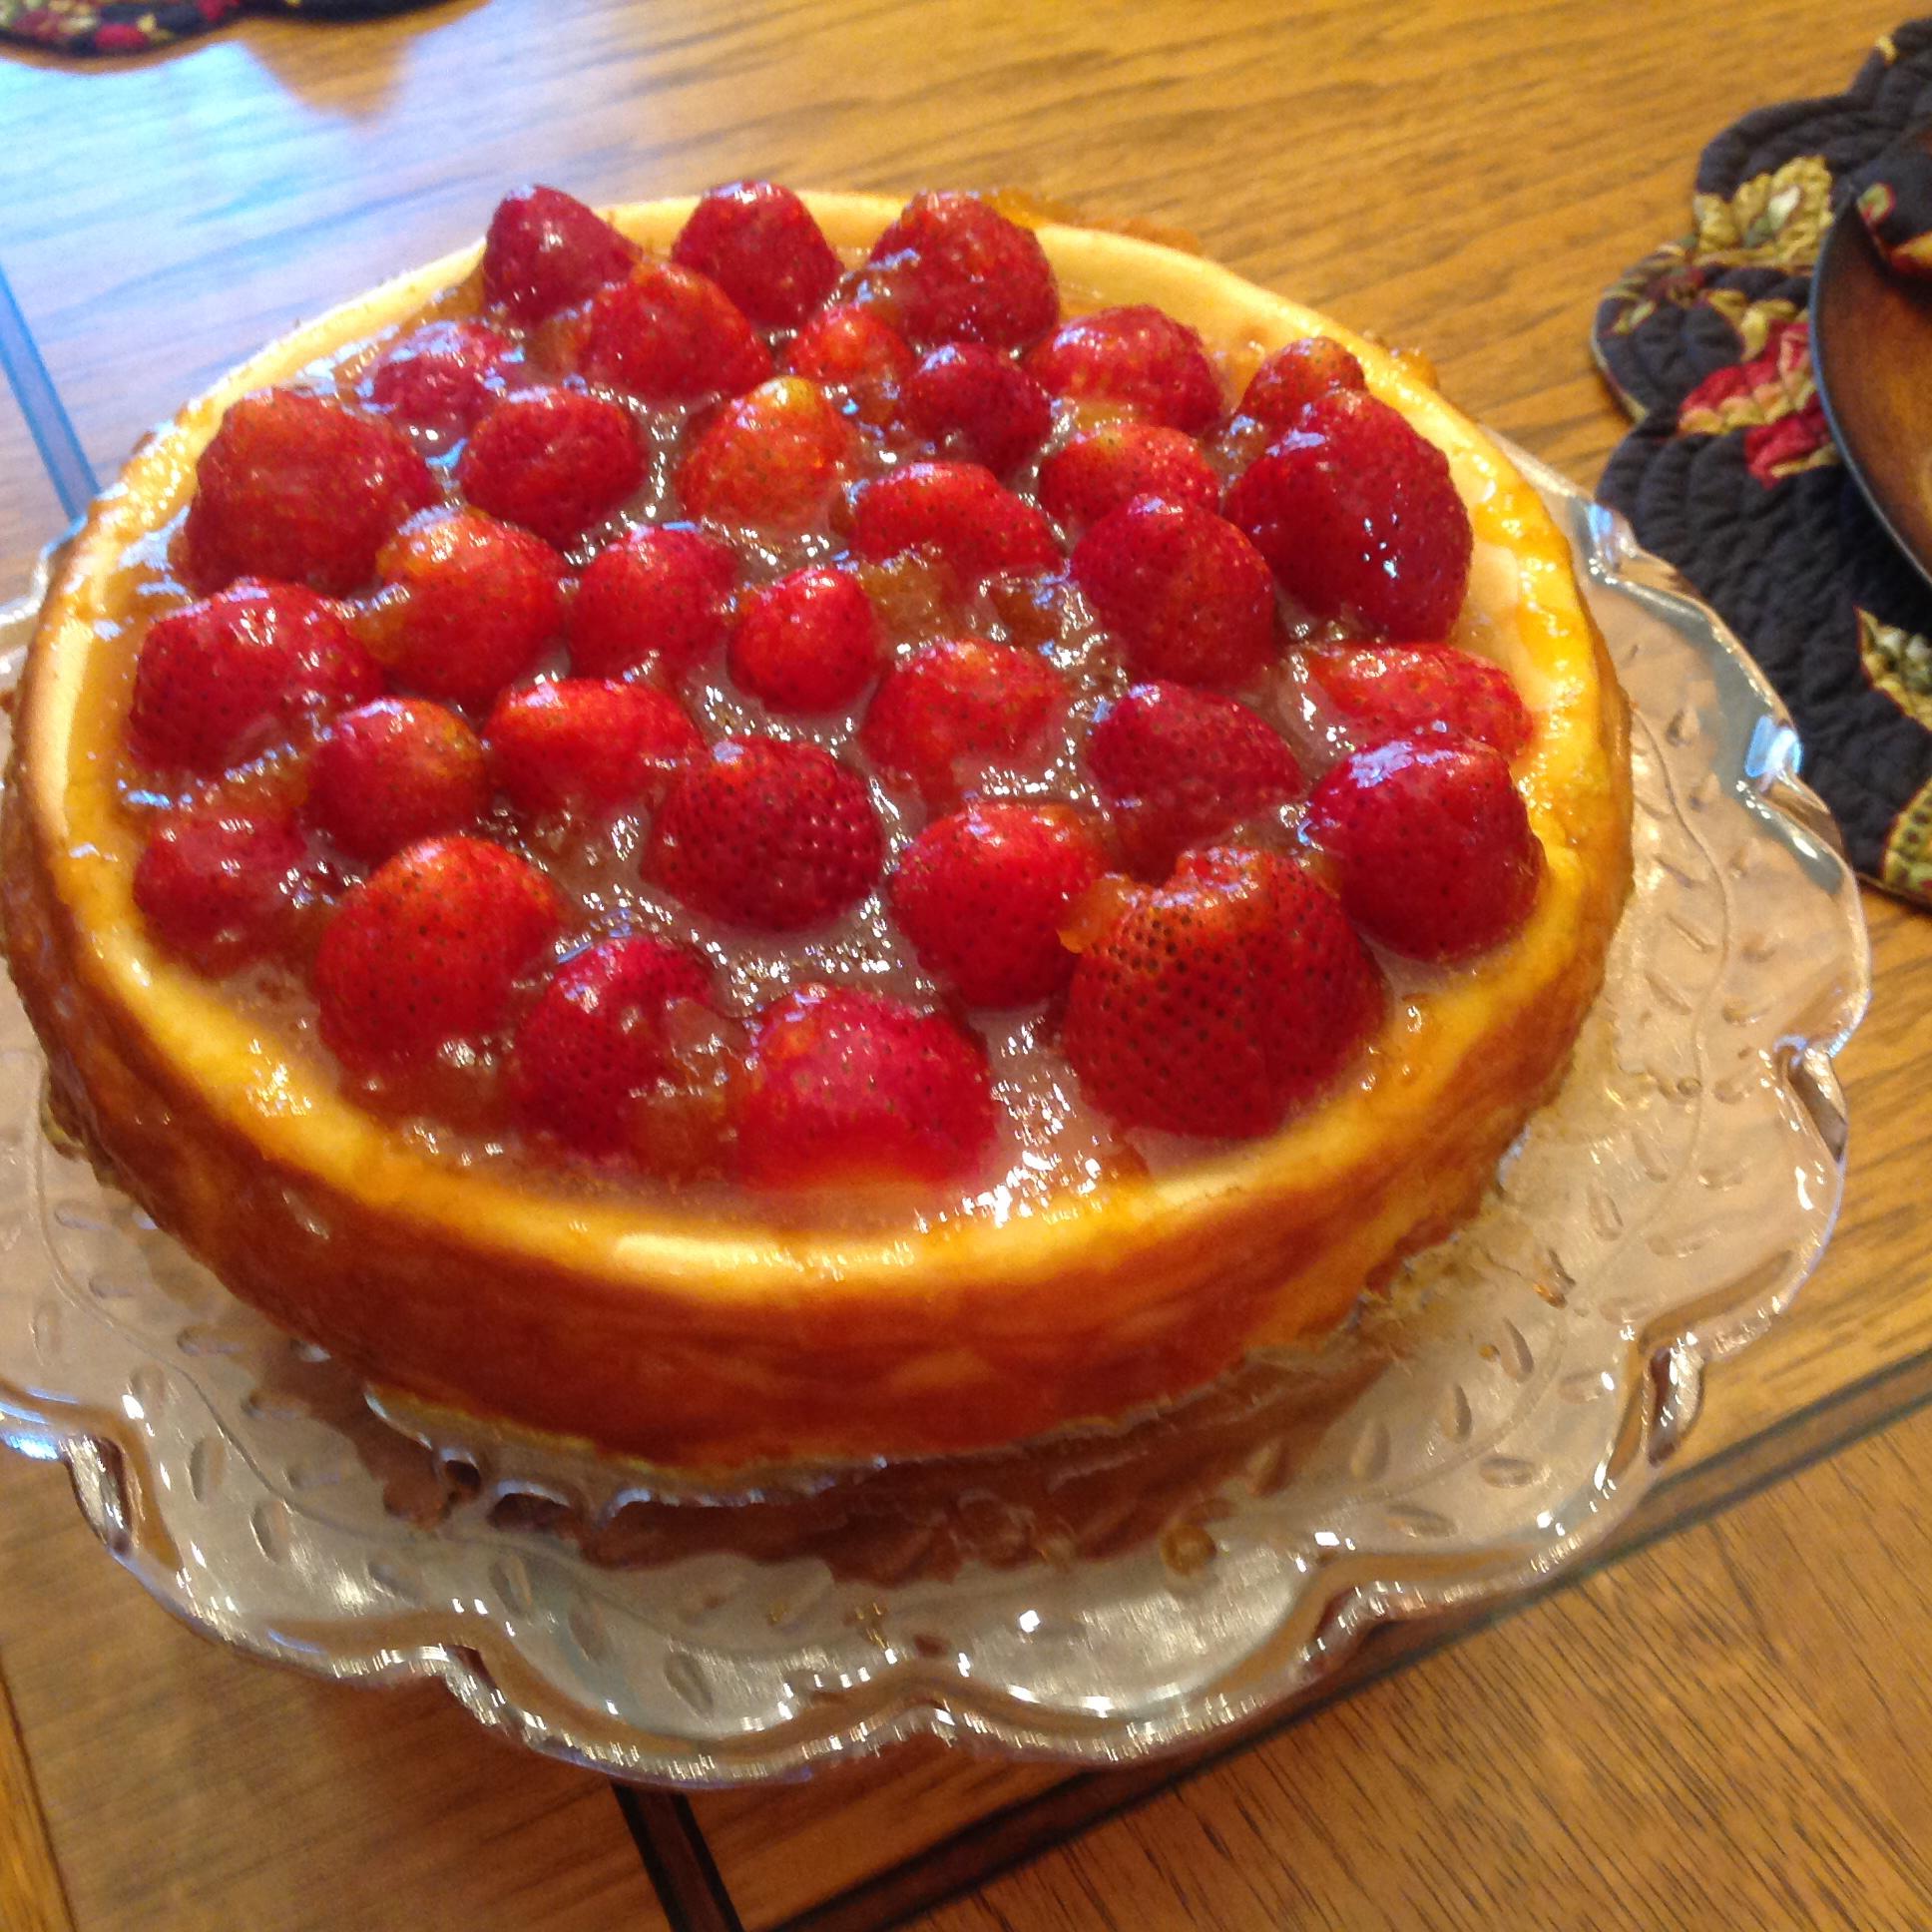 Bookbinder's Fabulous Cheesecake JJOHN32